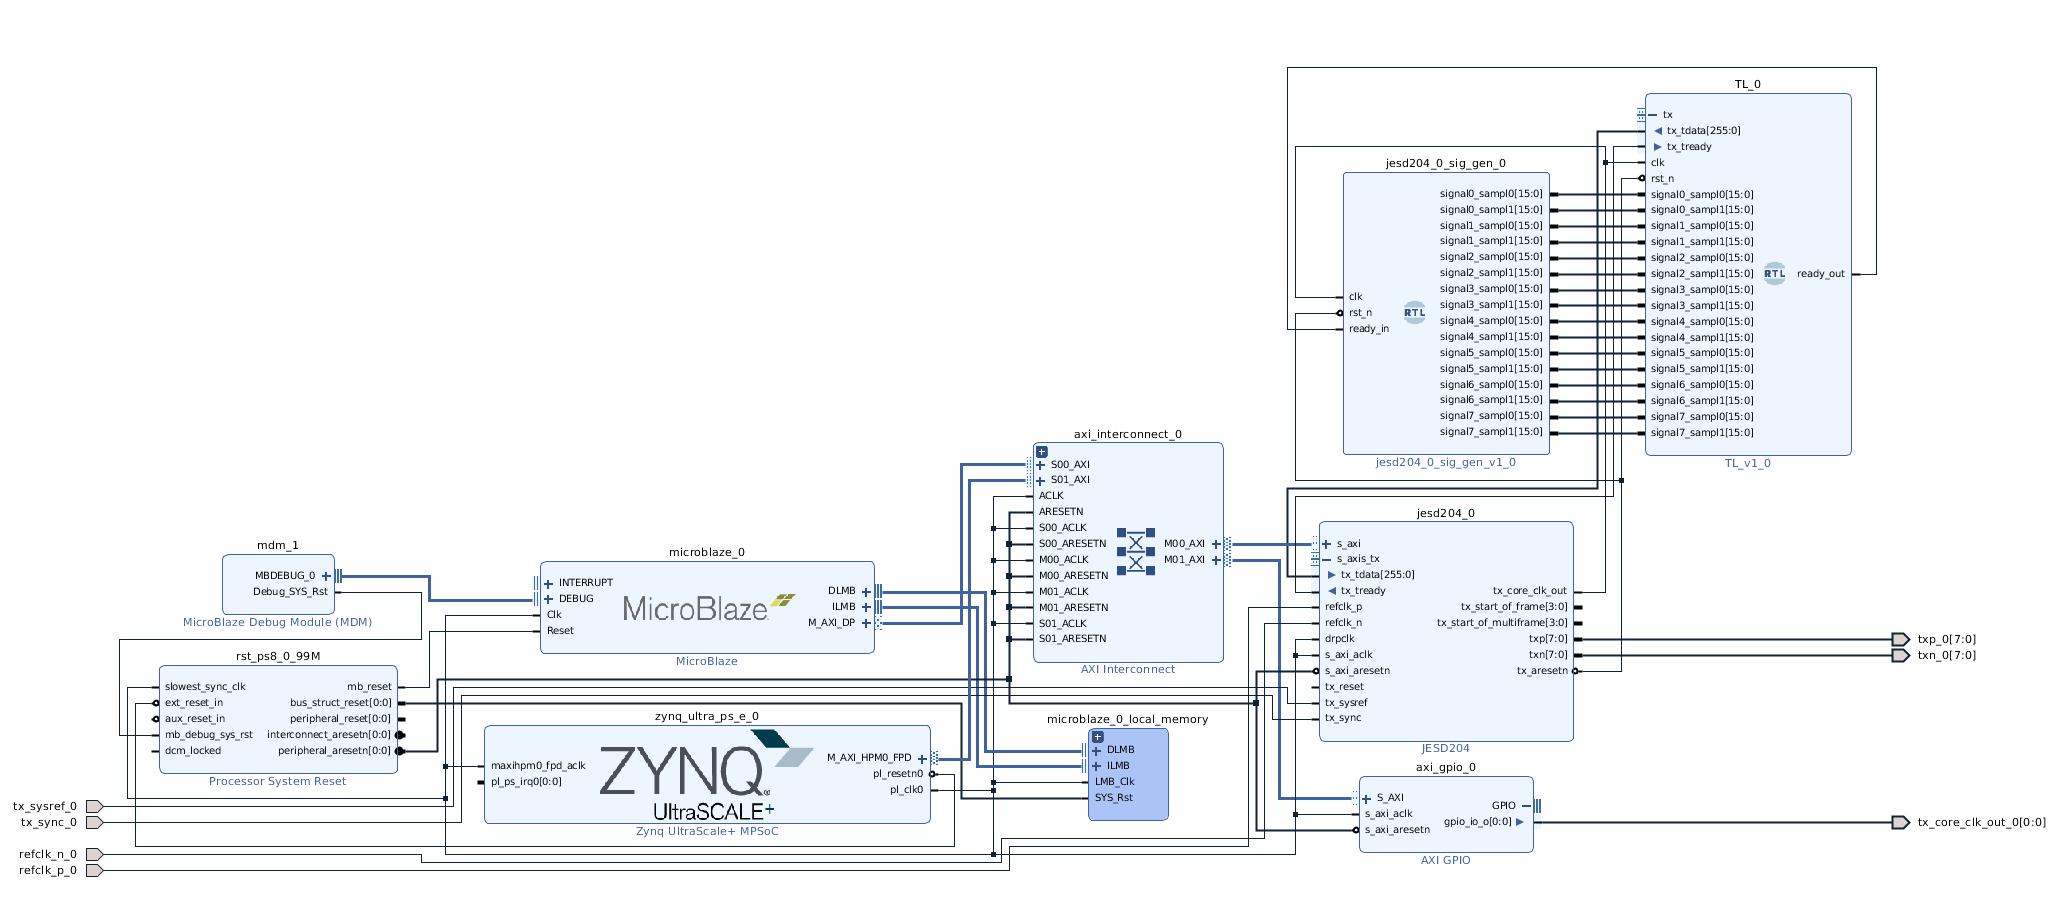 DAC37J84EVM: JESD Interface - Data converters forum - Data